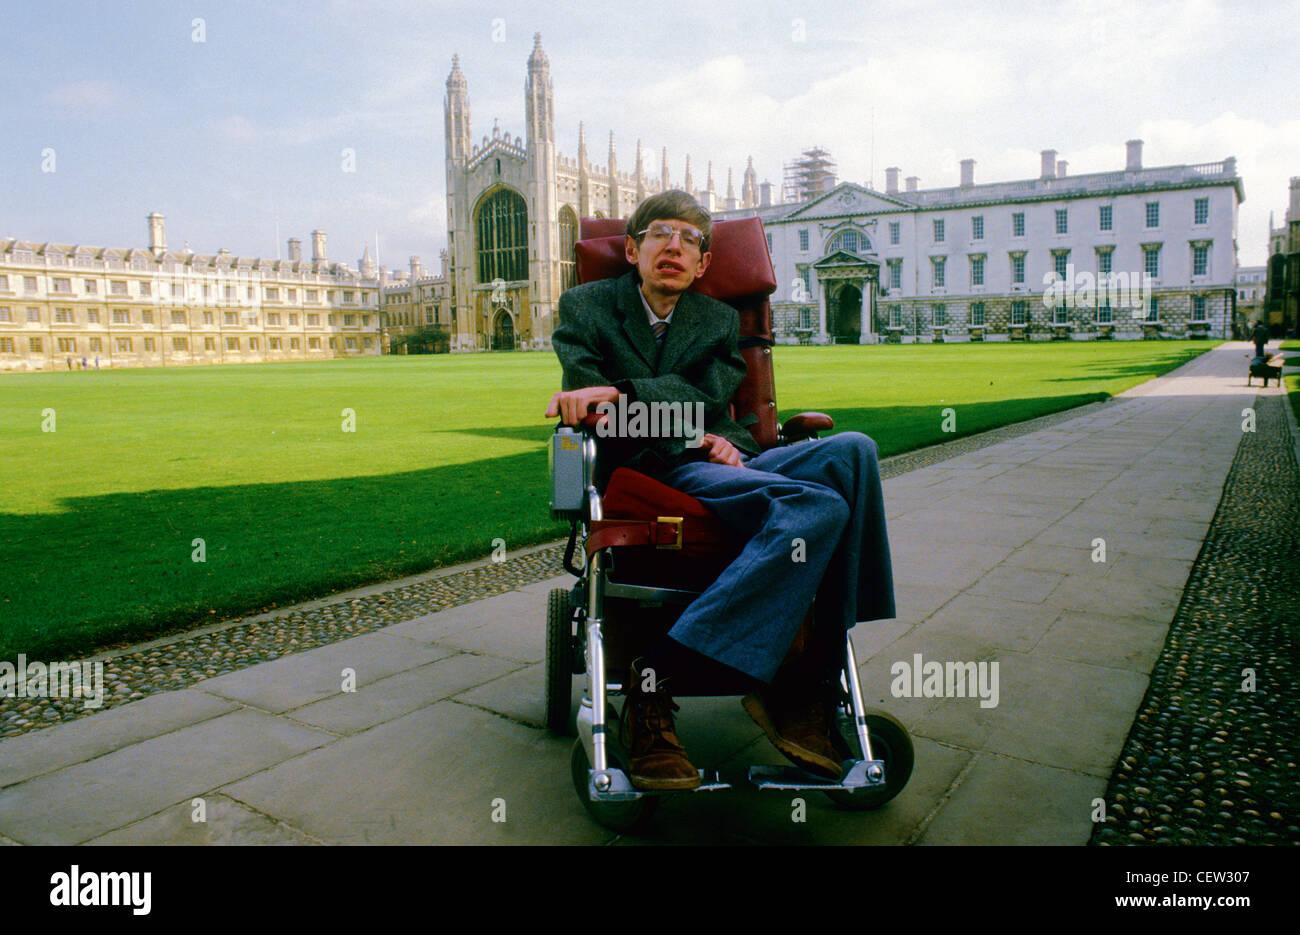 Stephen Hawkins in Cambridge - Stock Image